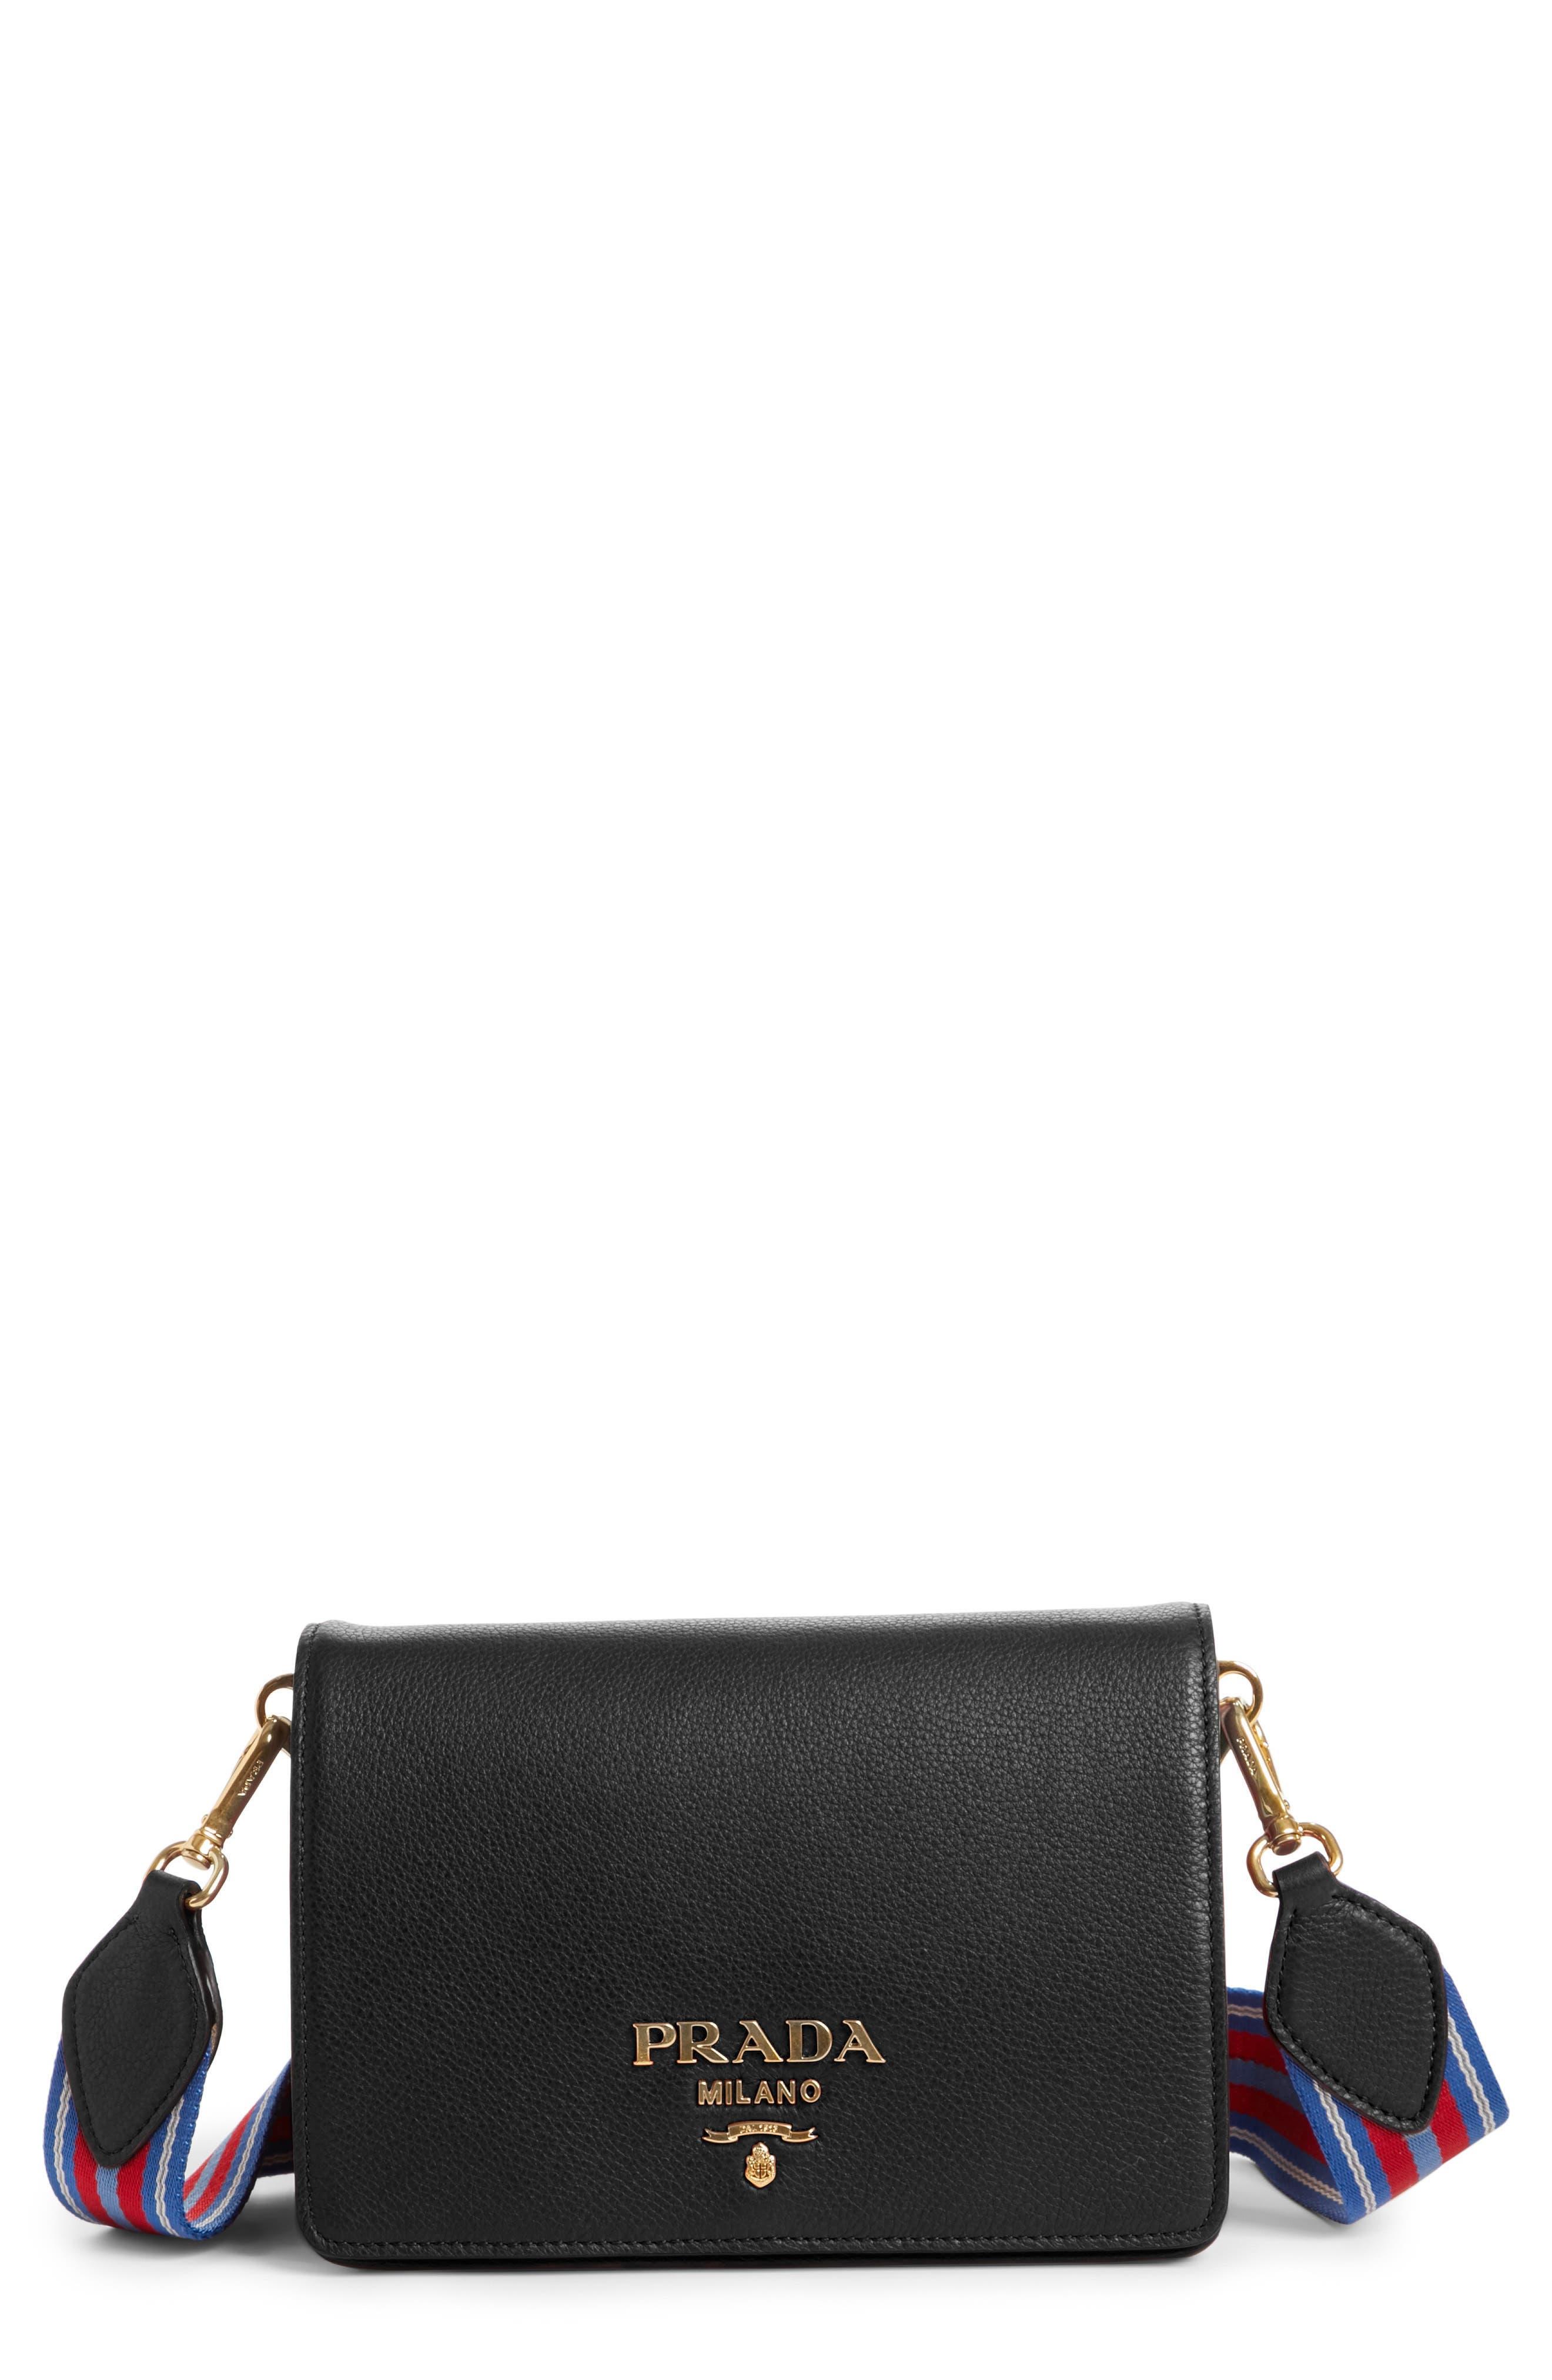 Vitello Daino Double Compartment Leather Shoulder Bag,                             Main thumbnail 1, color,                             NERO